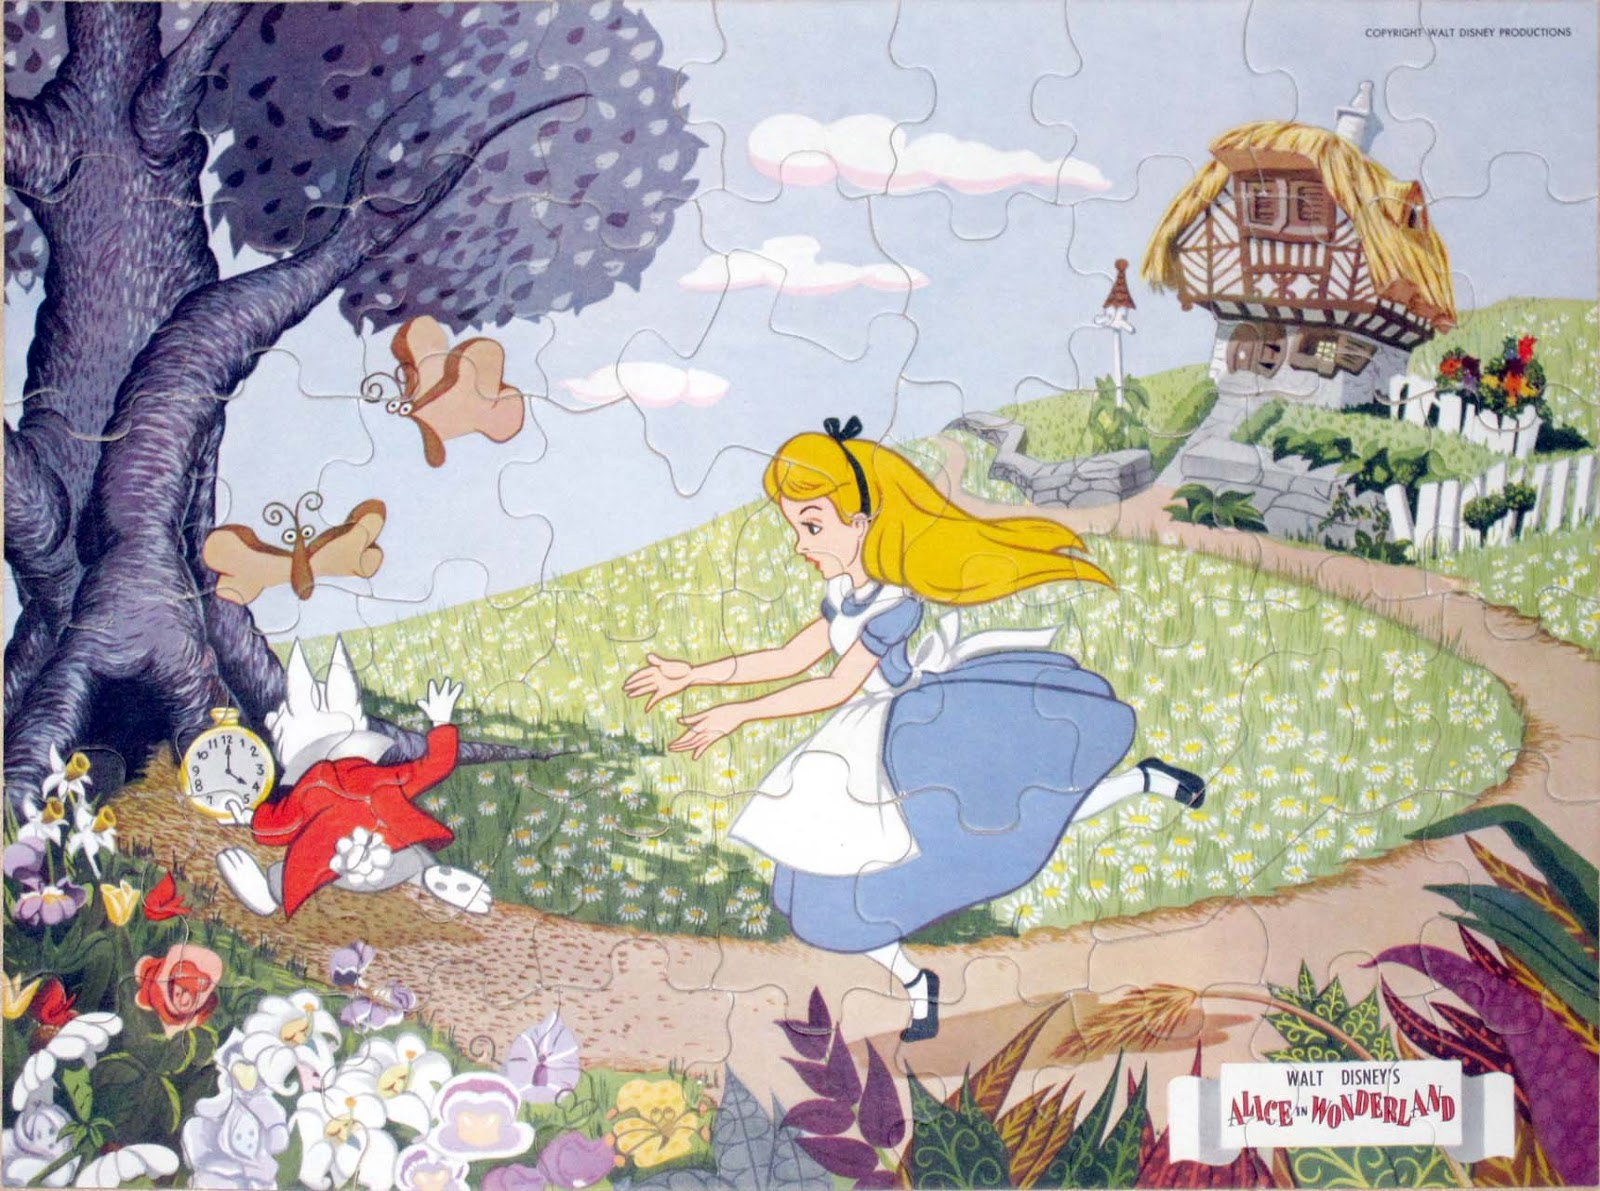 Works based on Alice in Wonderland  Wikipedia